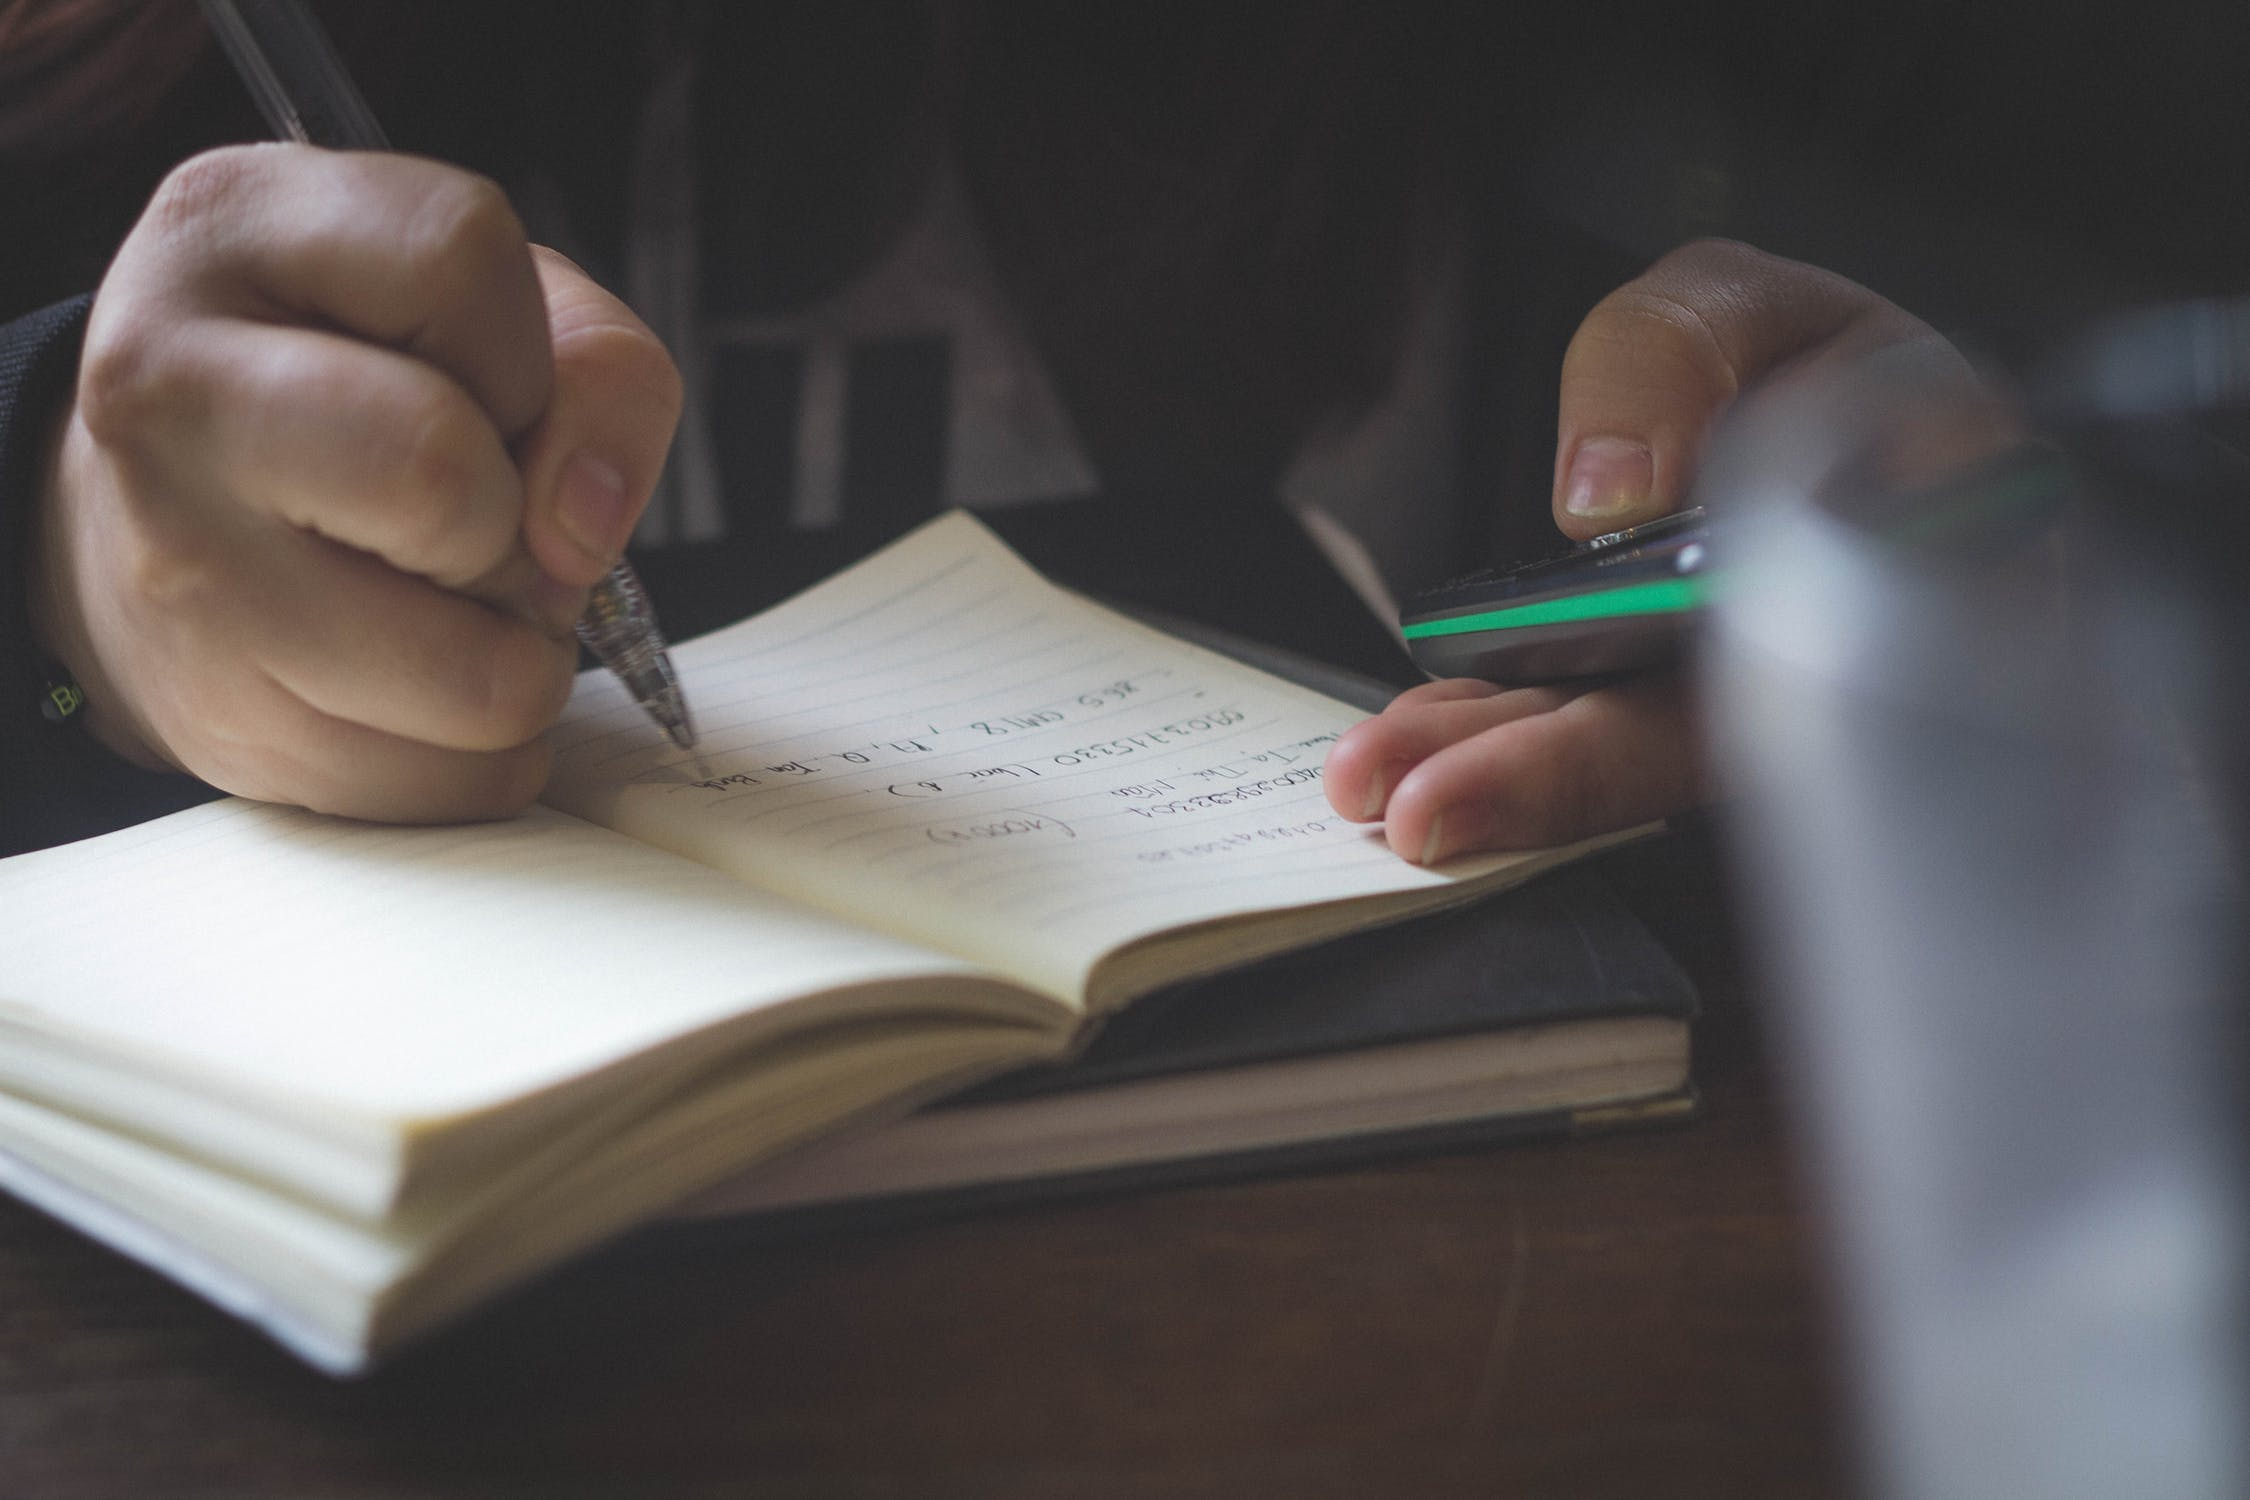 Blaise Joseph: Back to Homework